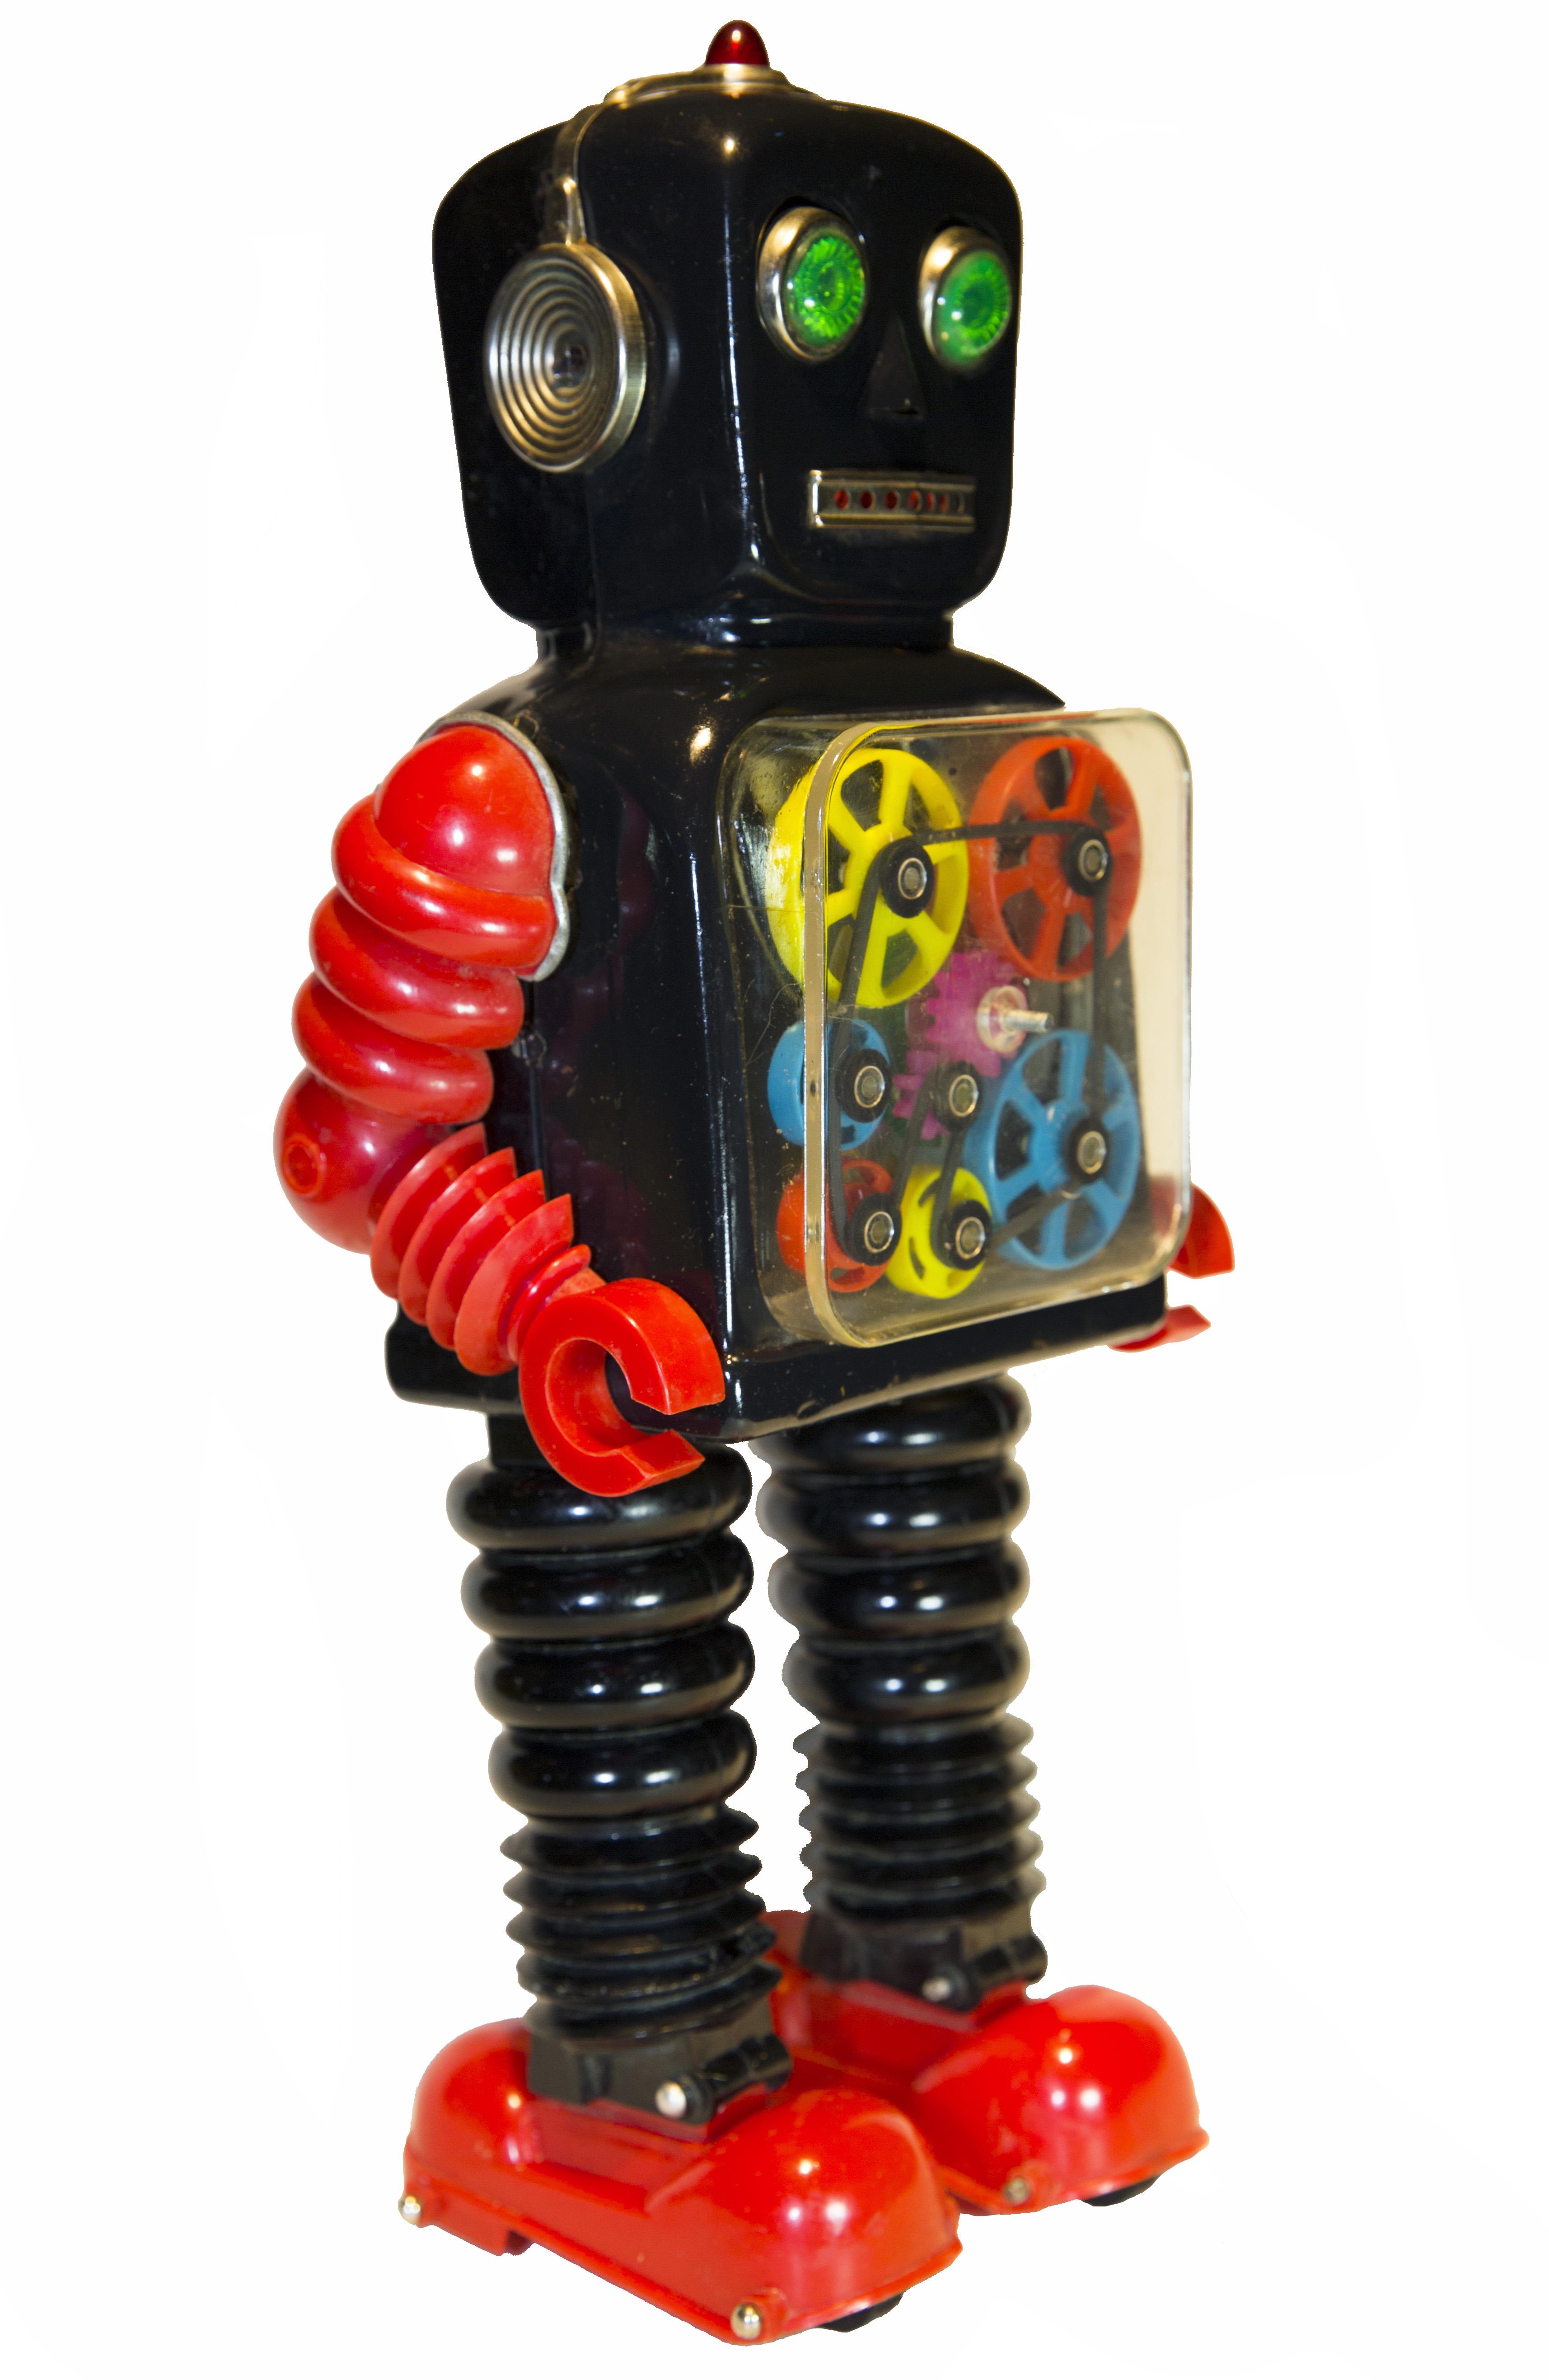 BLINK-A-GEAR ROBOT ELECTRONIC